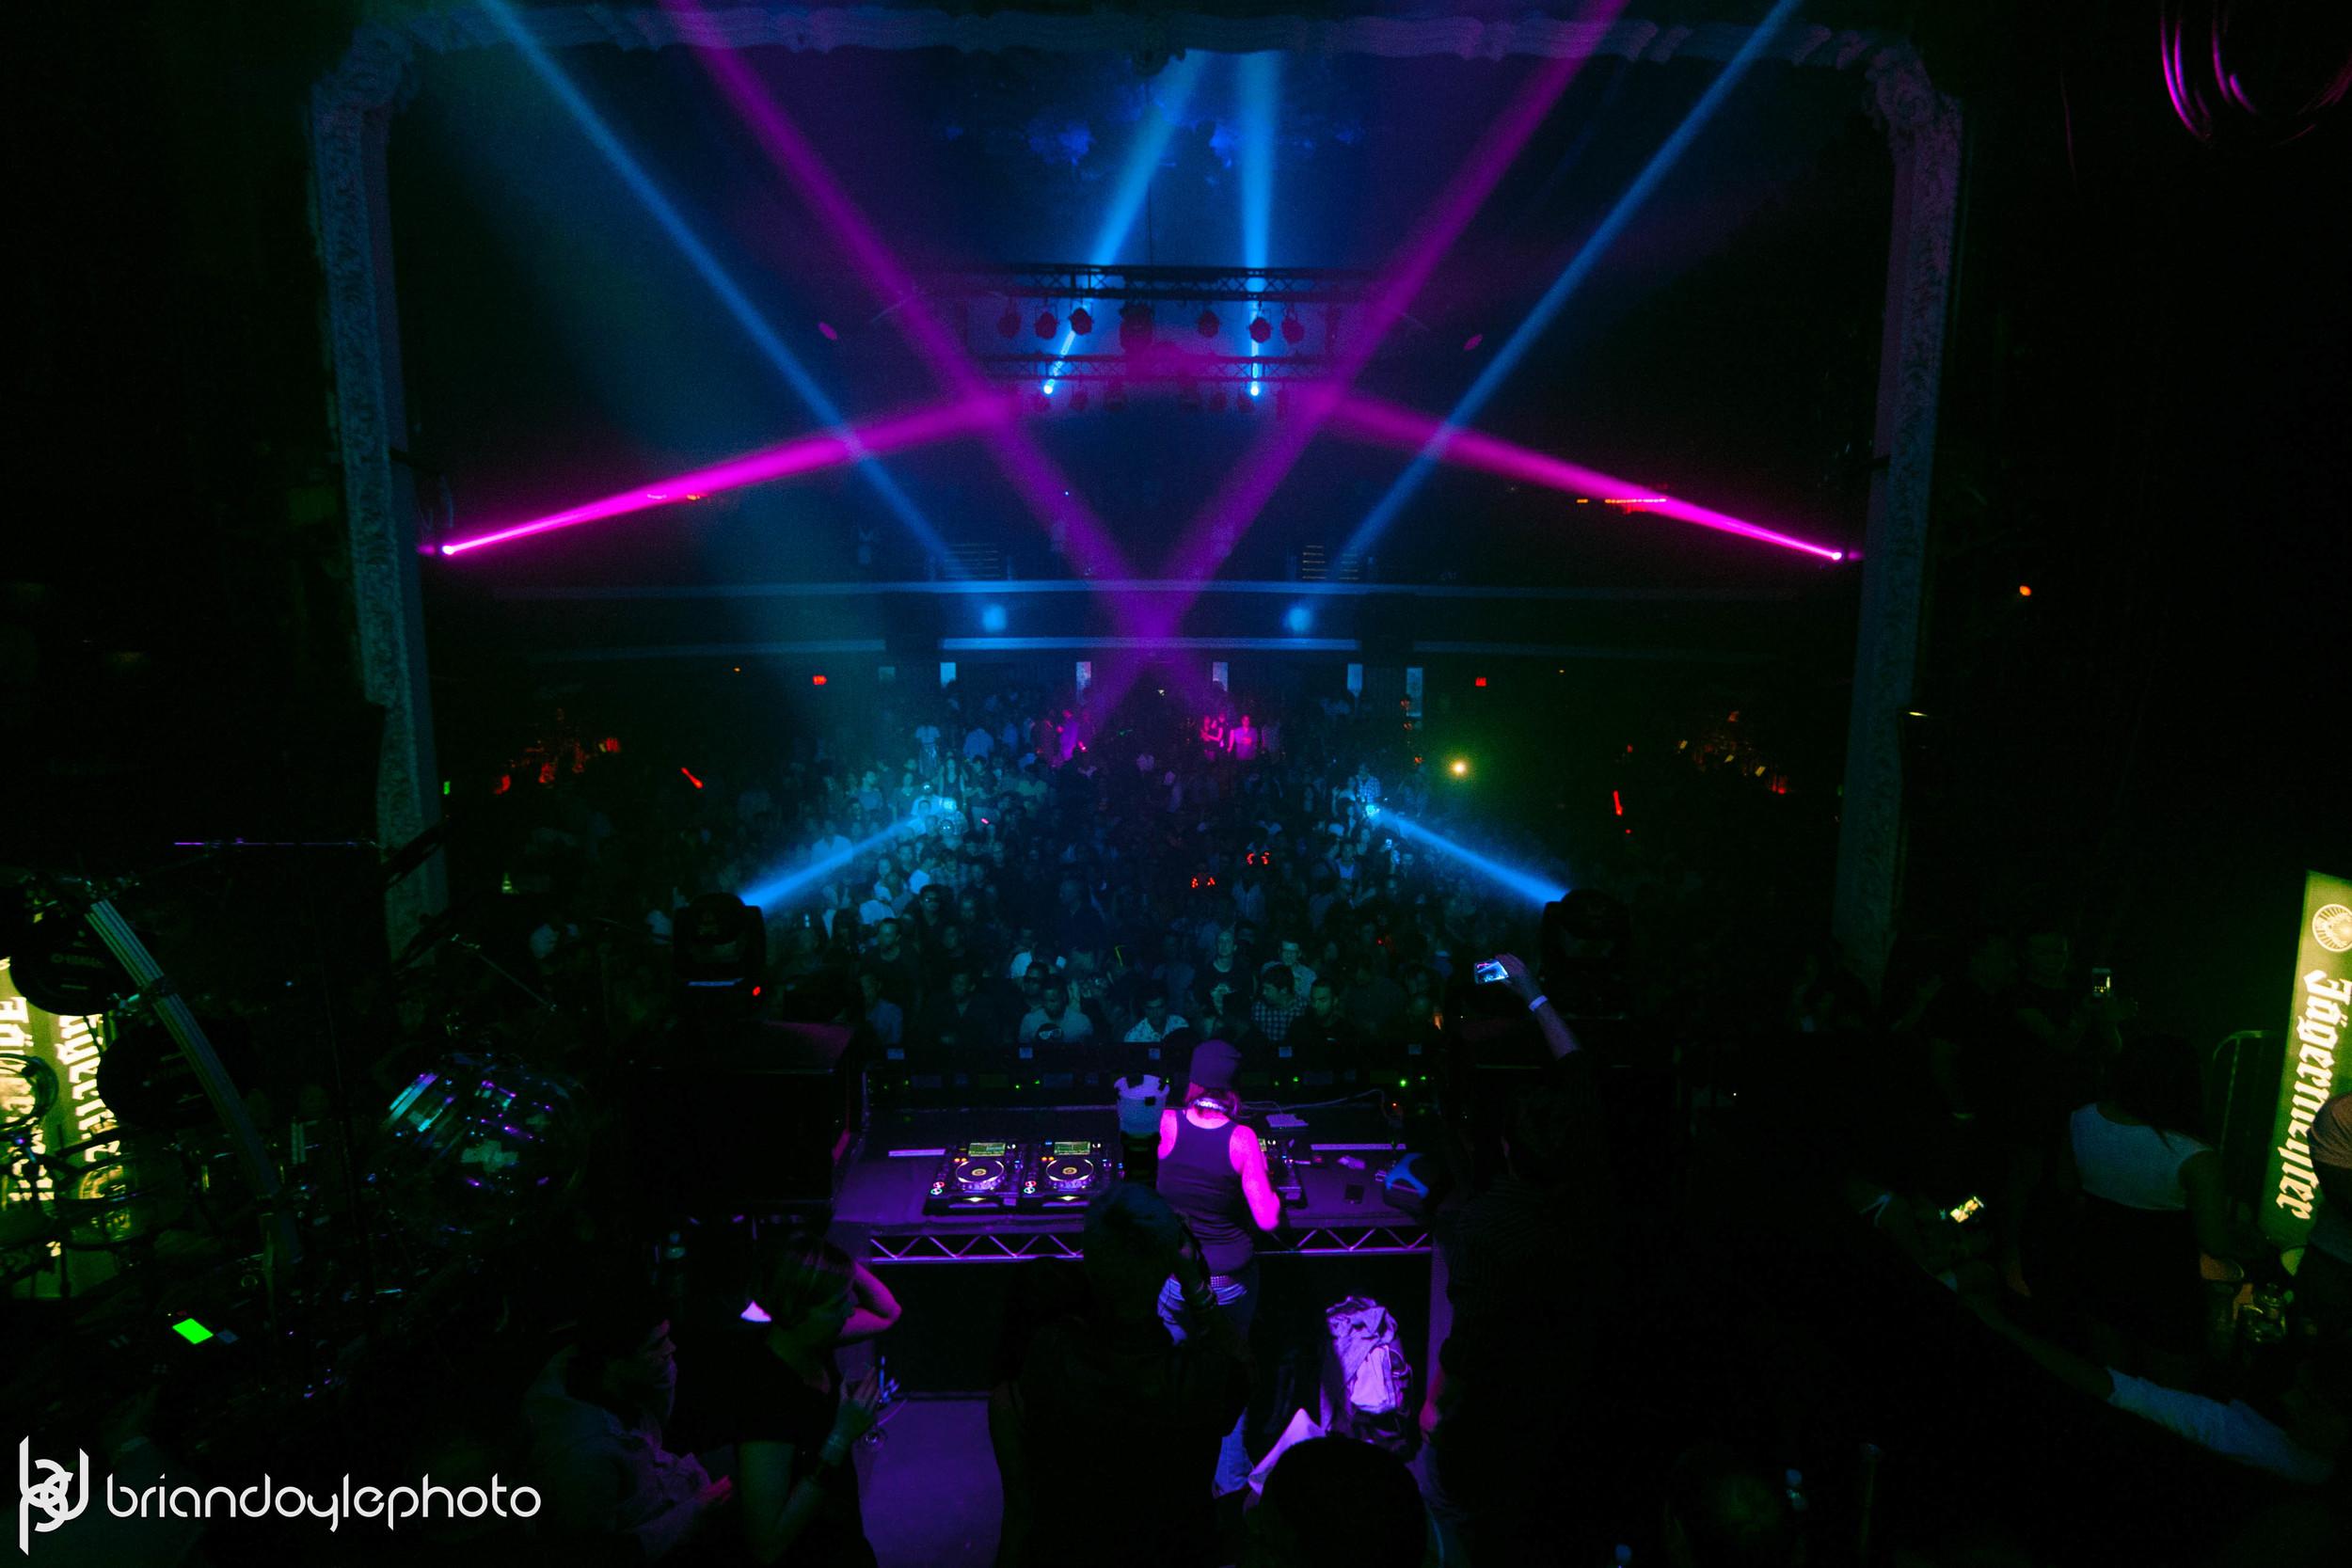 Jagermeister Presents - Paul Oakenfold @ Avalon bdp 27.09.14-18.jpg